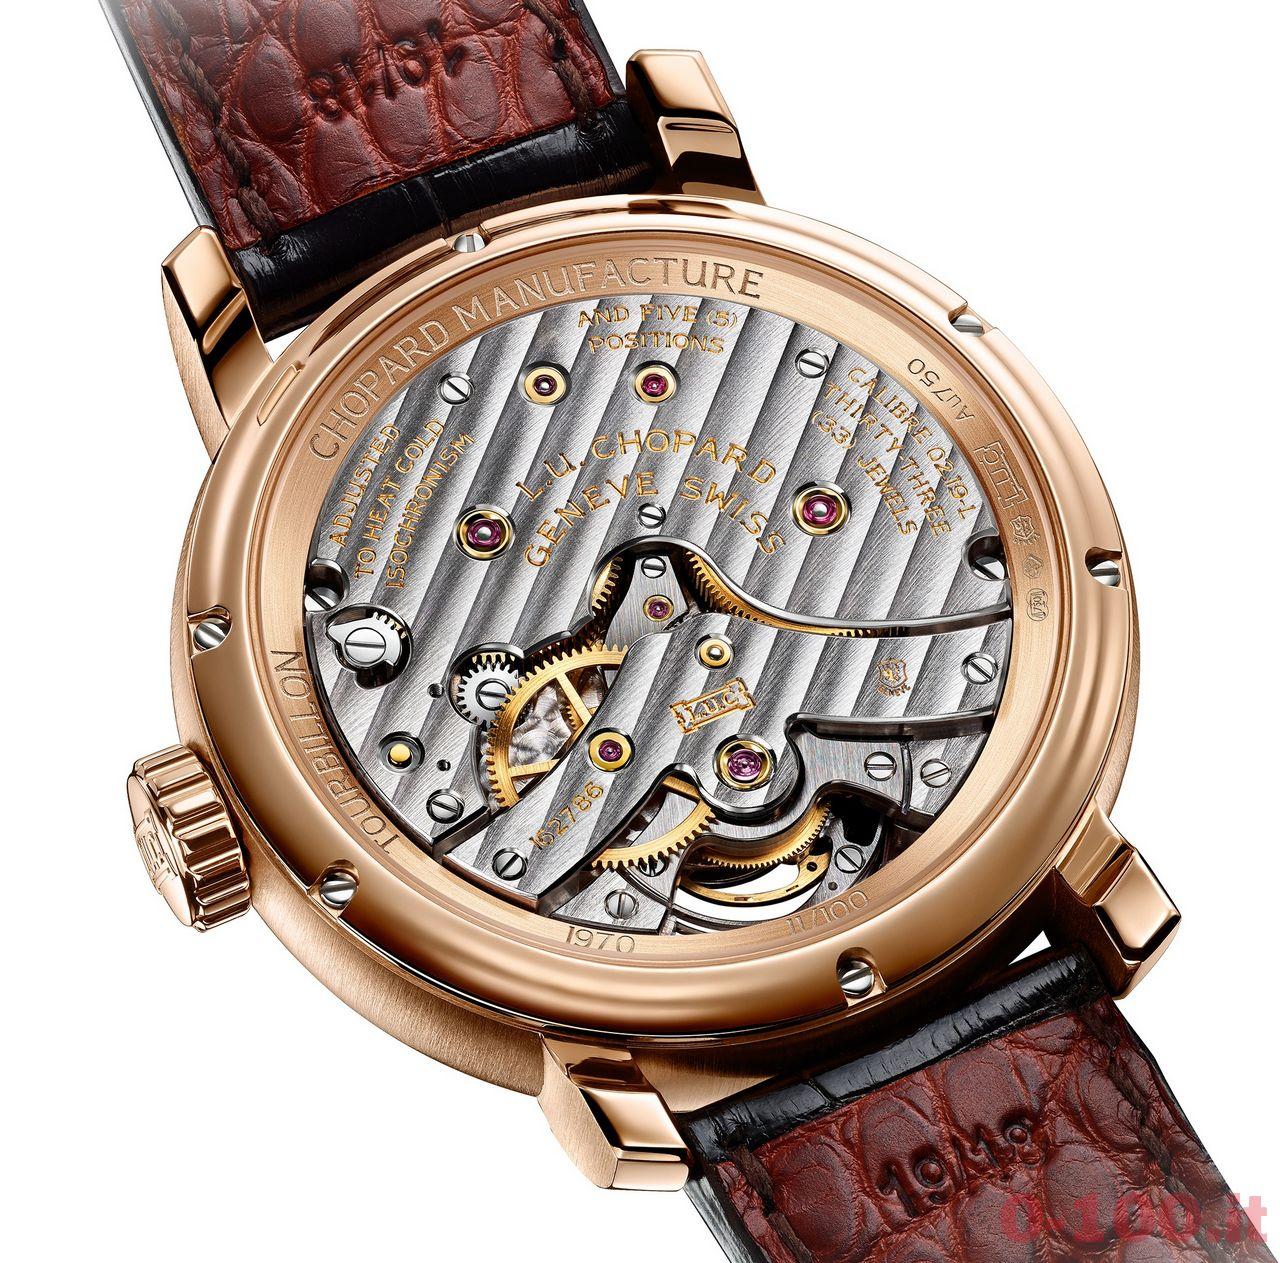 chopard-l-u-c-1963-tourbillon-ref-161970-5001-price_0-1004